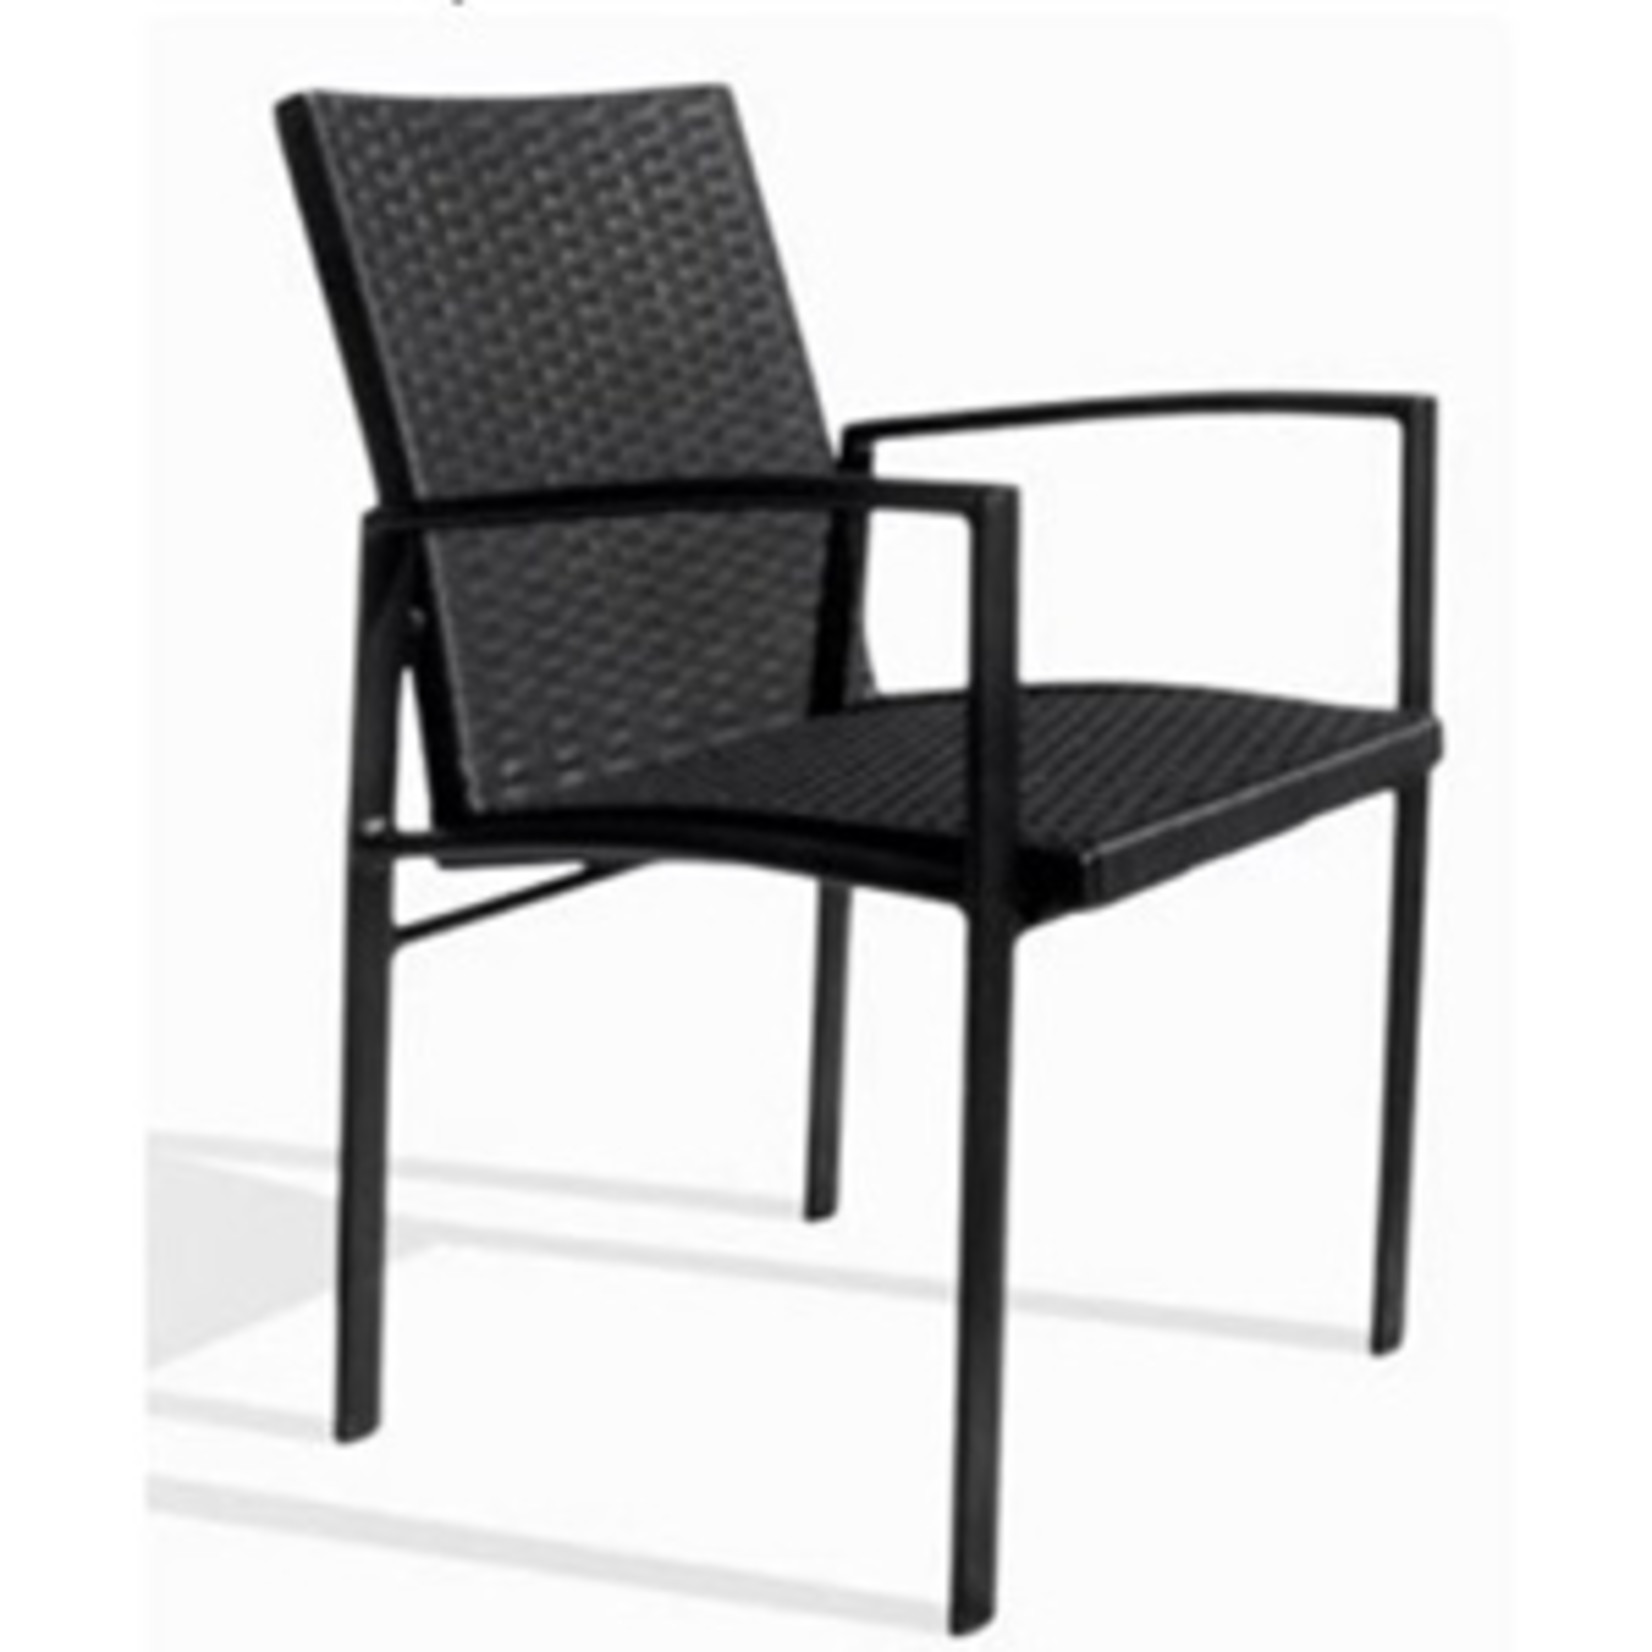 Harmony Studio Carcara Dining Chair